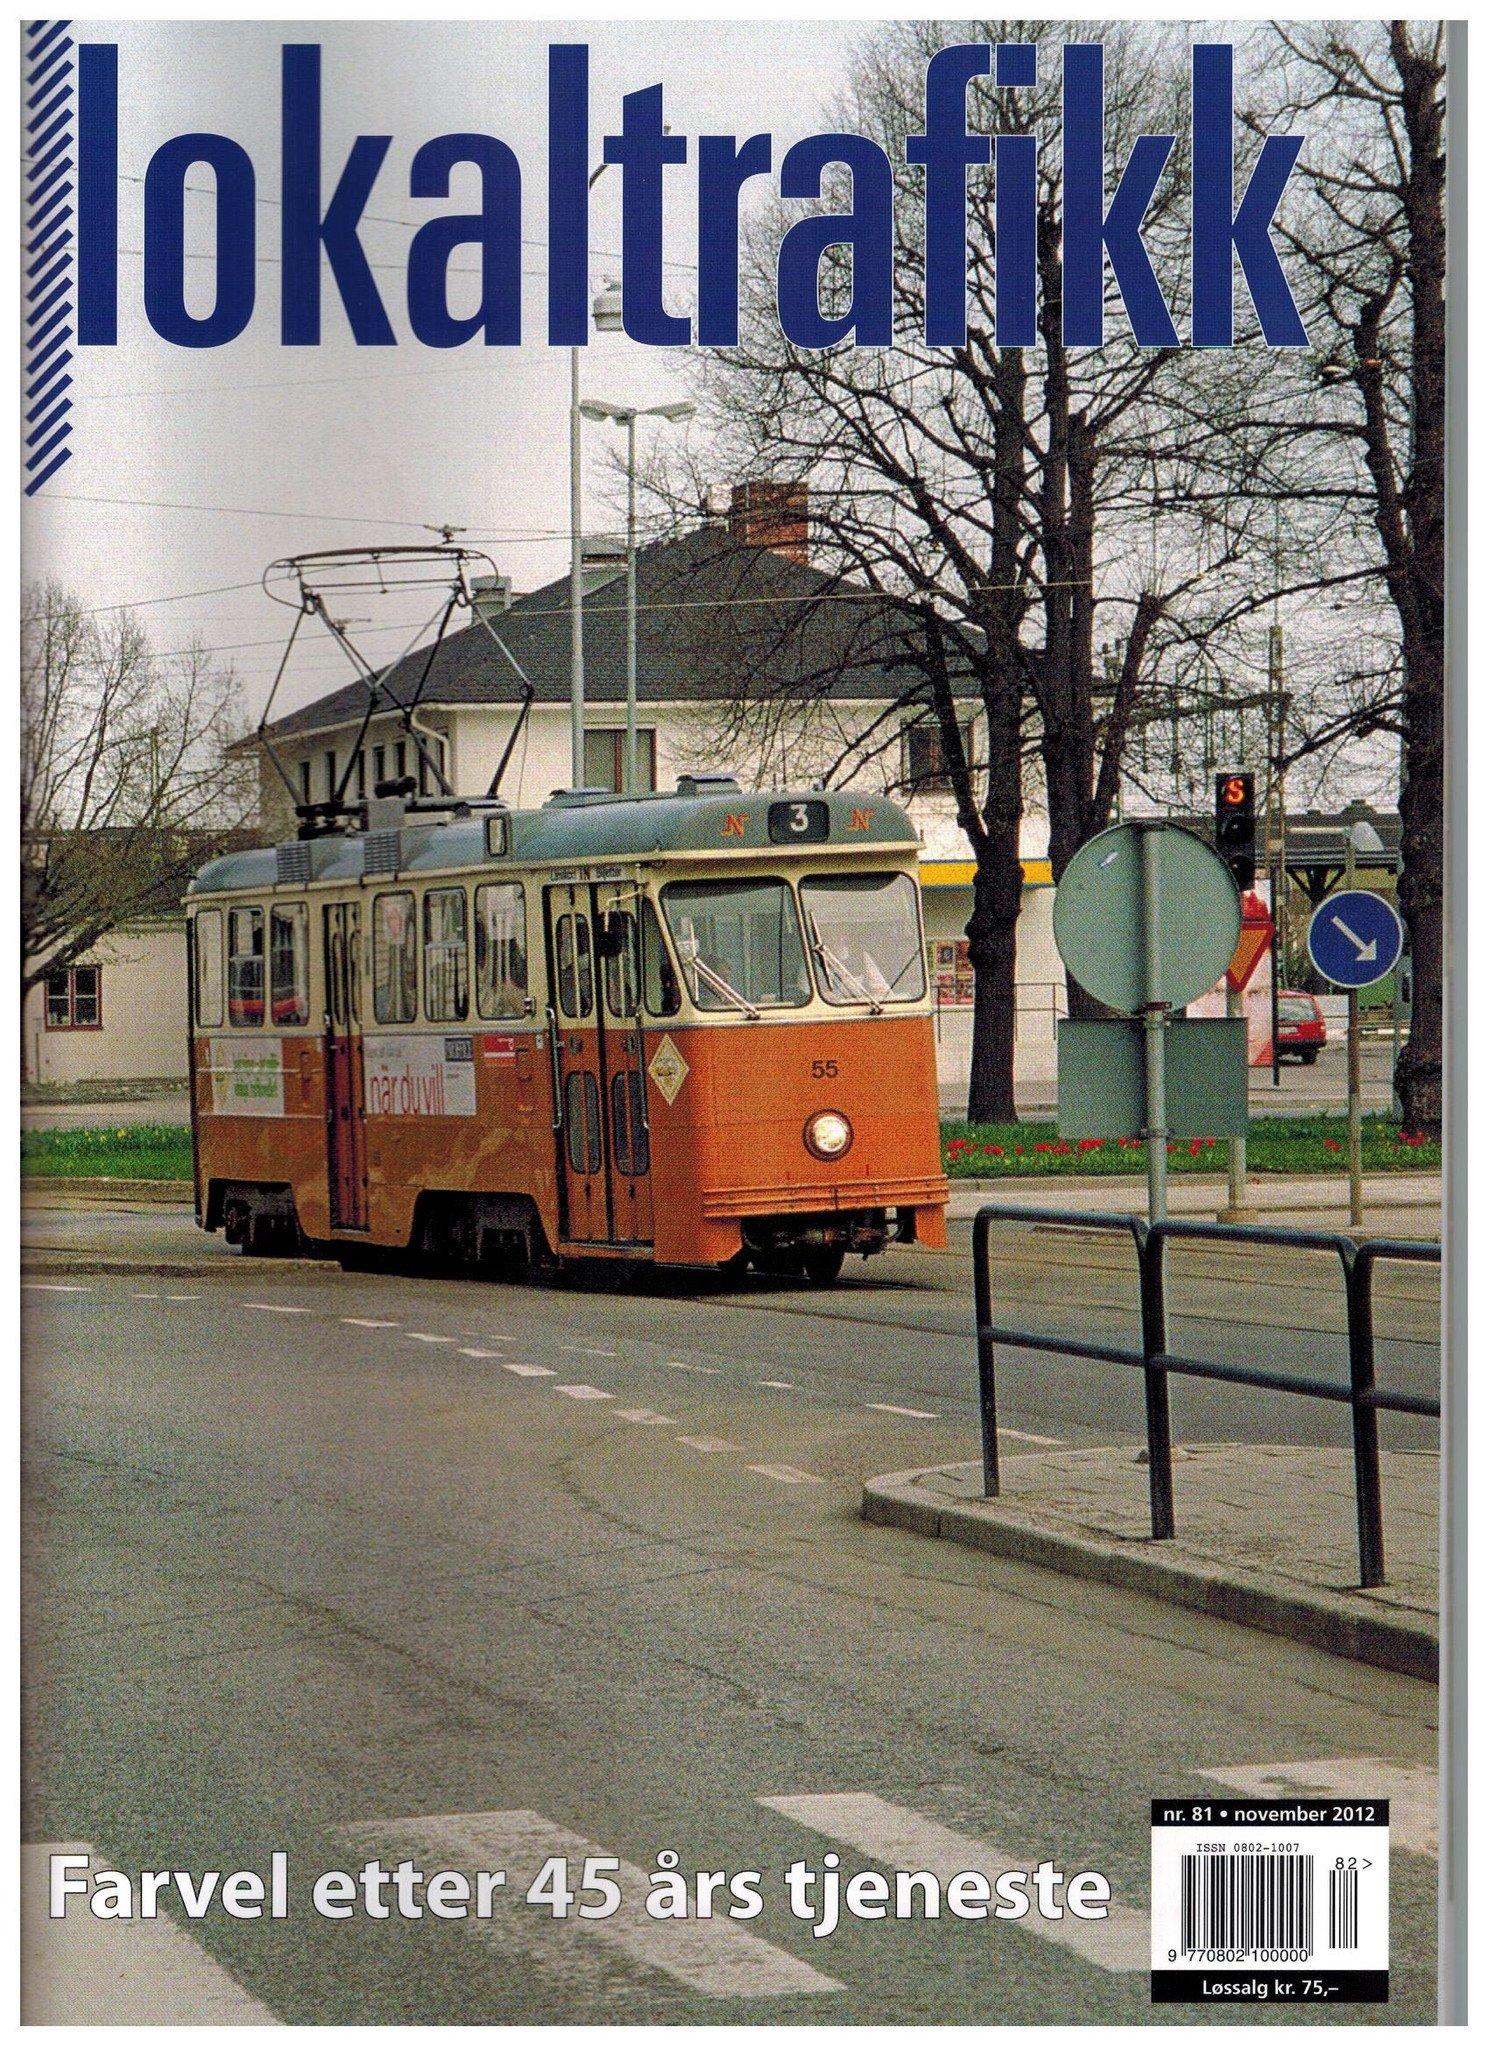 Lokaltrafikk #081